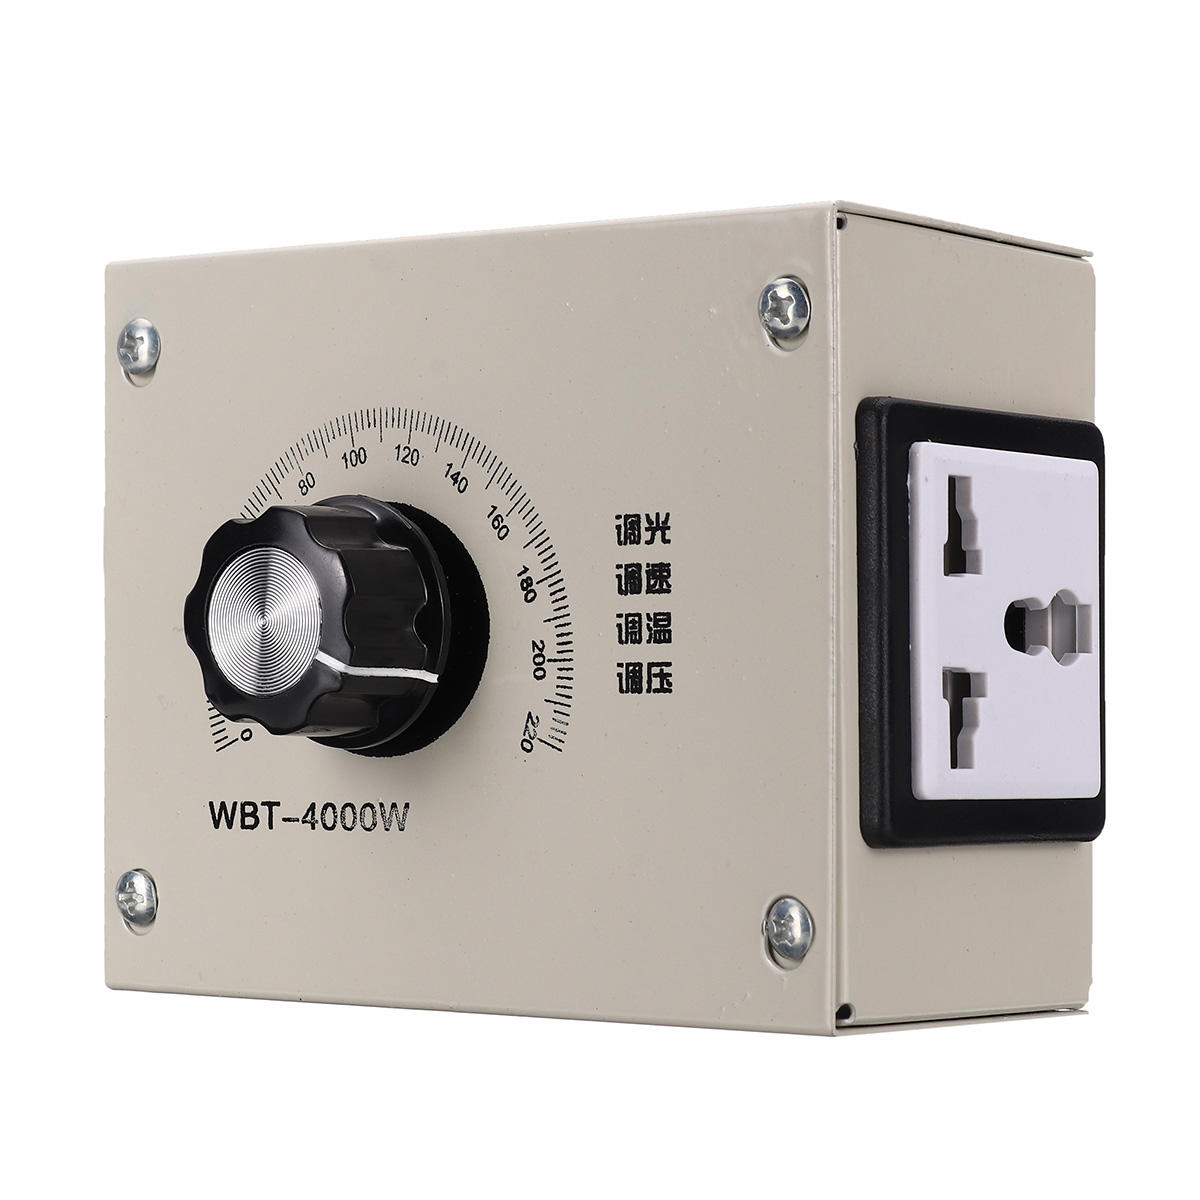 AC 0-220V 4000W Adjustable Voltage Speed Temperature Dimmer Controller For Thermostat Light Fan Motor Dimmer